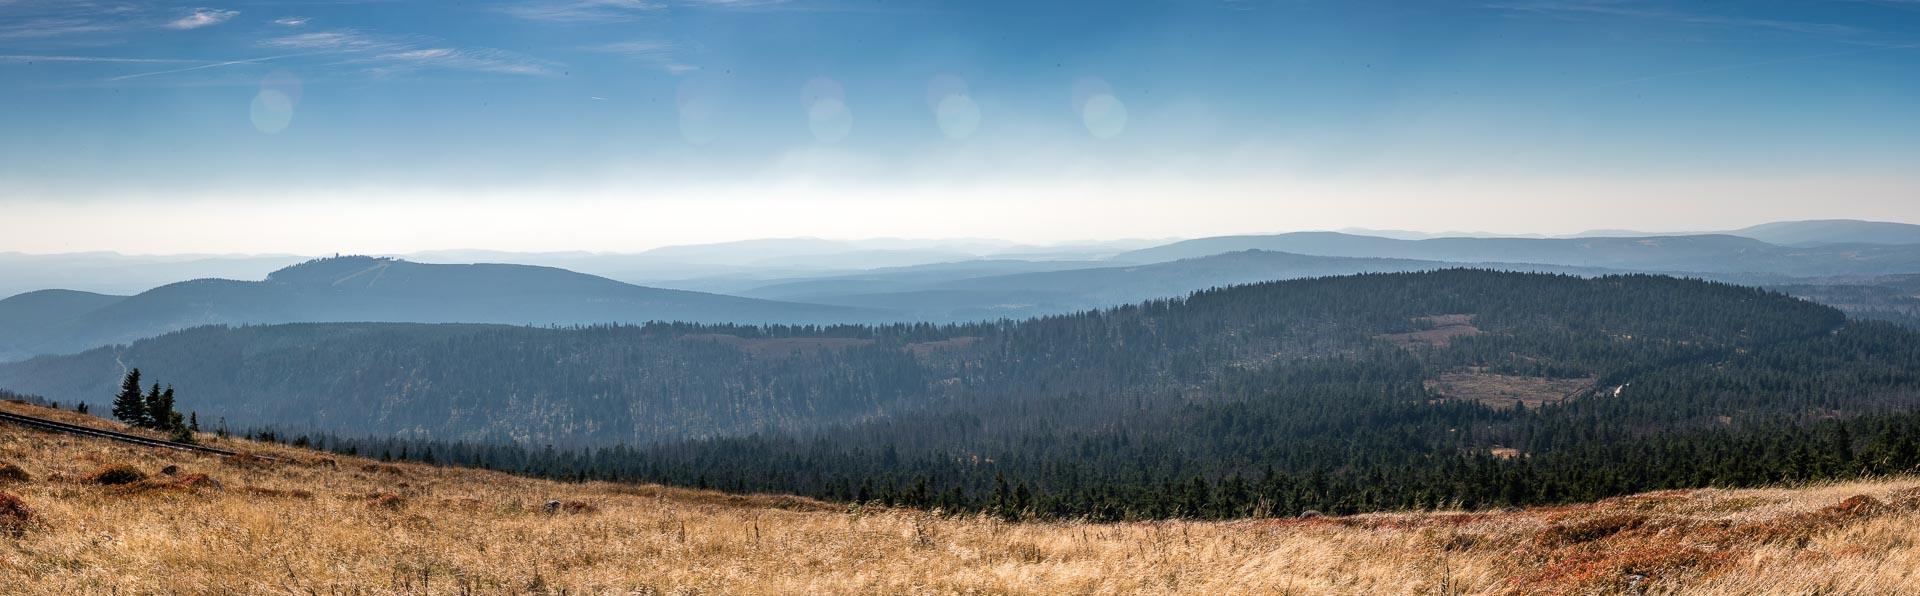 Spontaner Kurzurlaub im Harz, Braunlage.